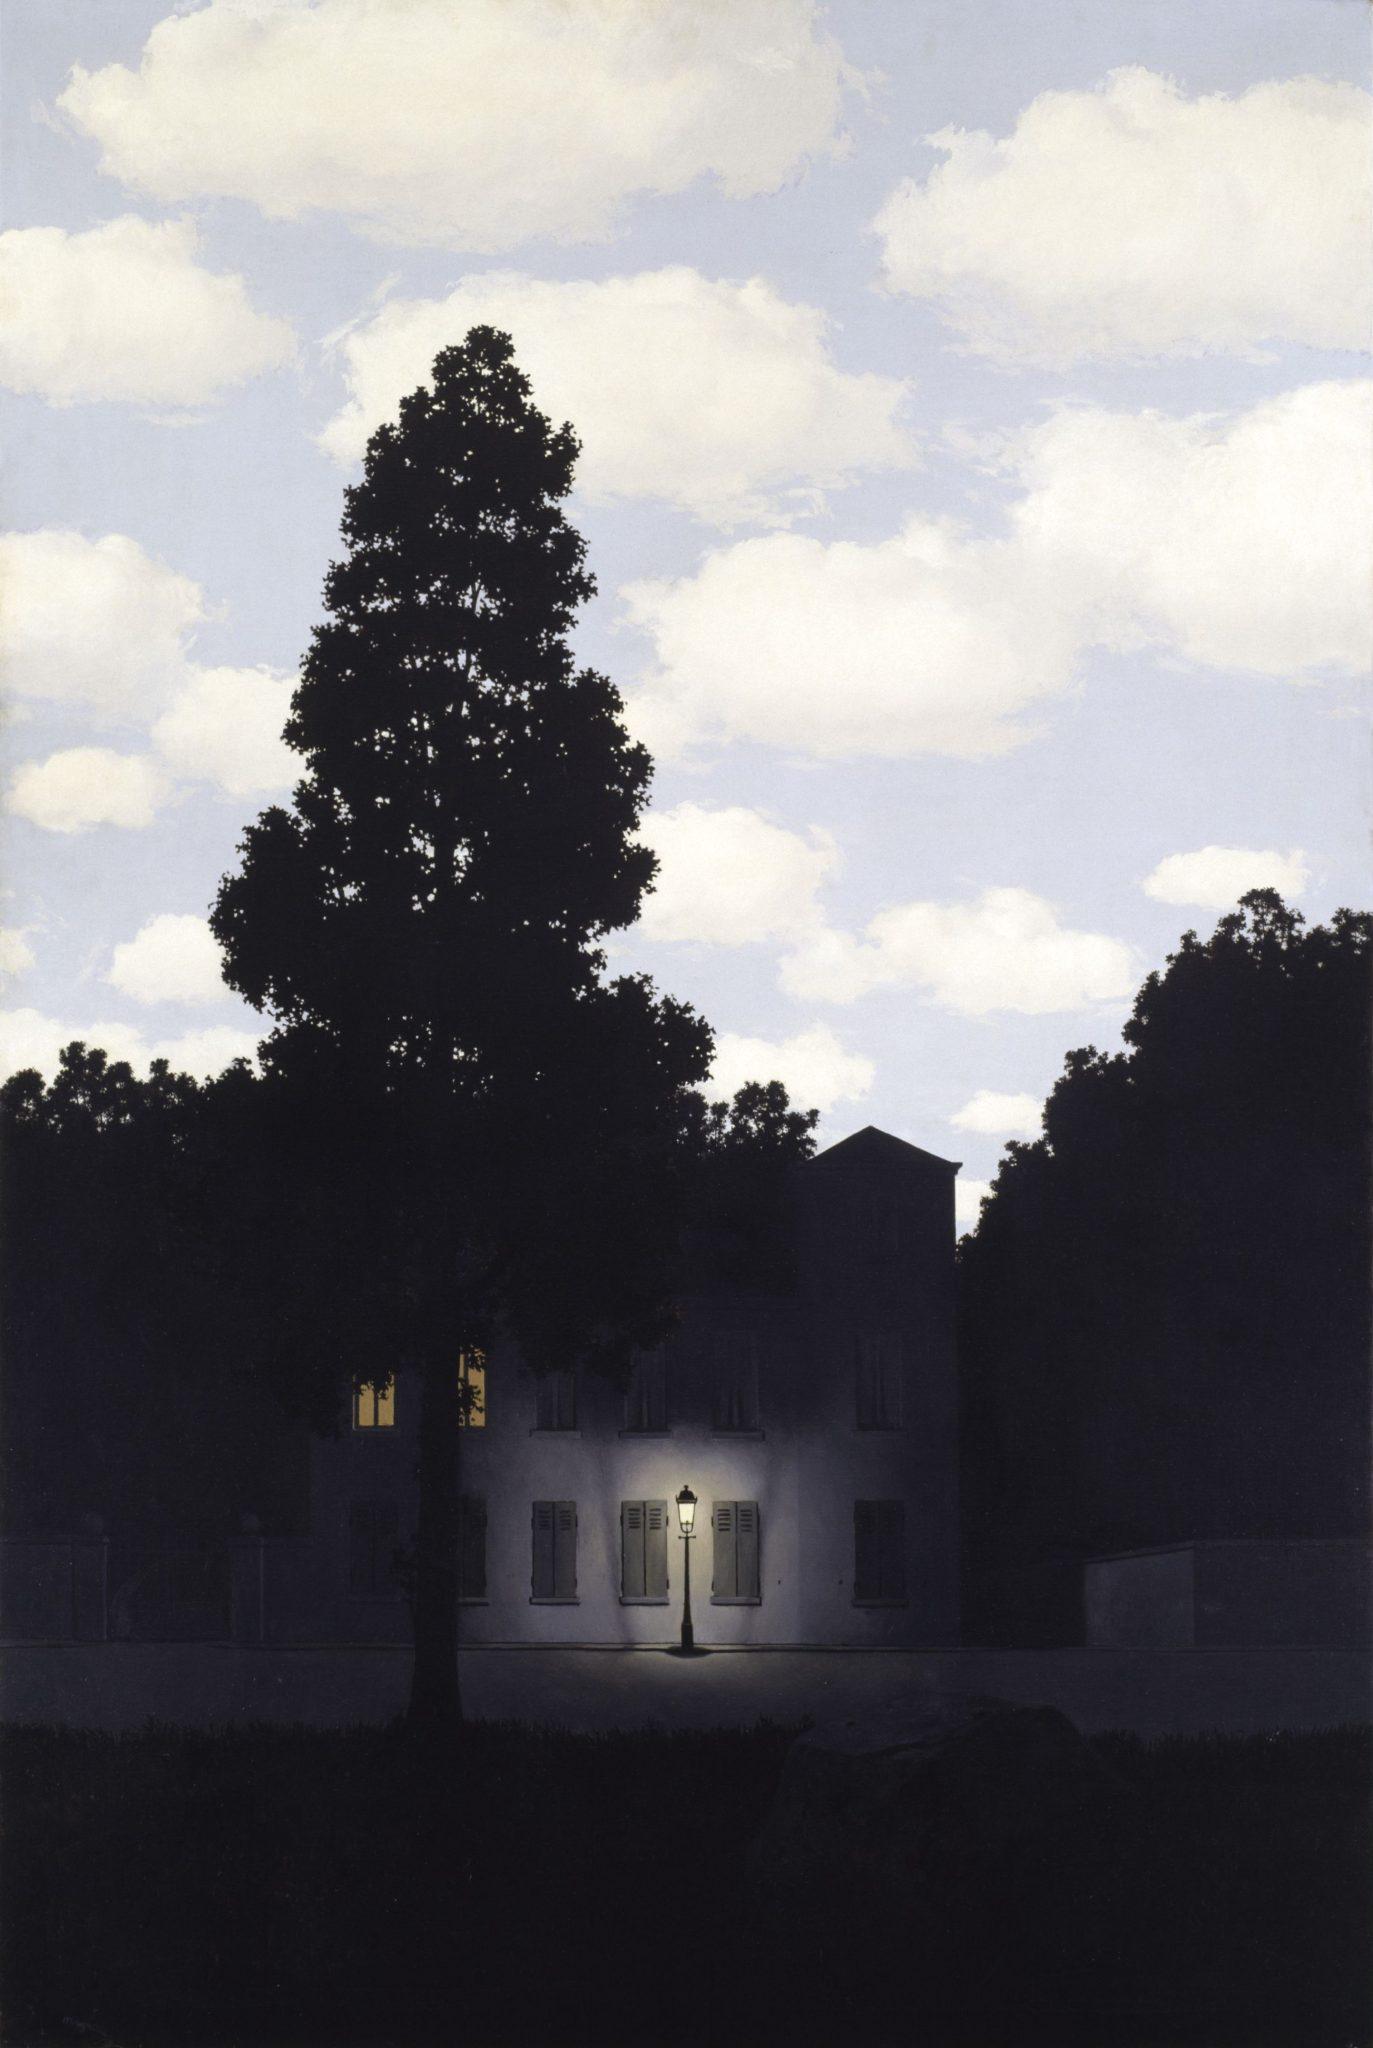 Magritte, Impero della luce, Guggenheim, Venezia